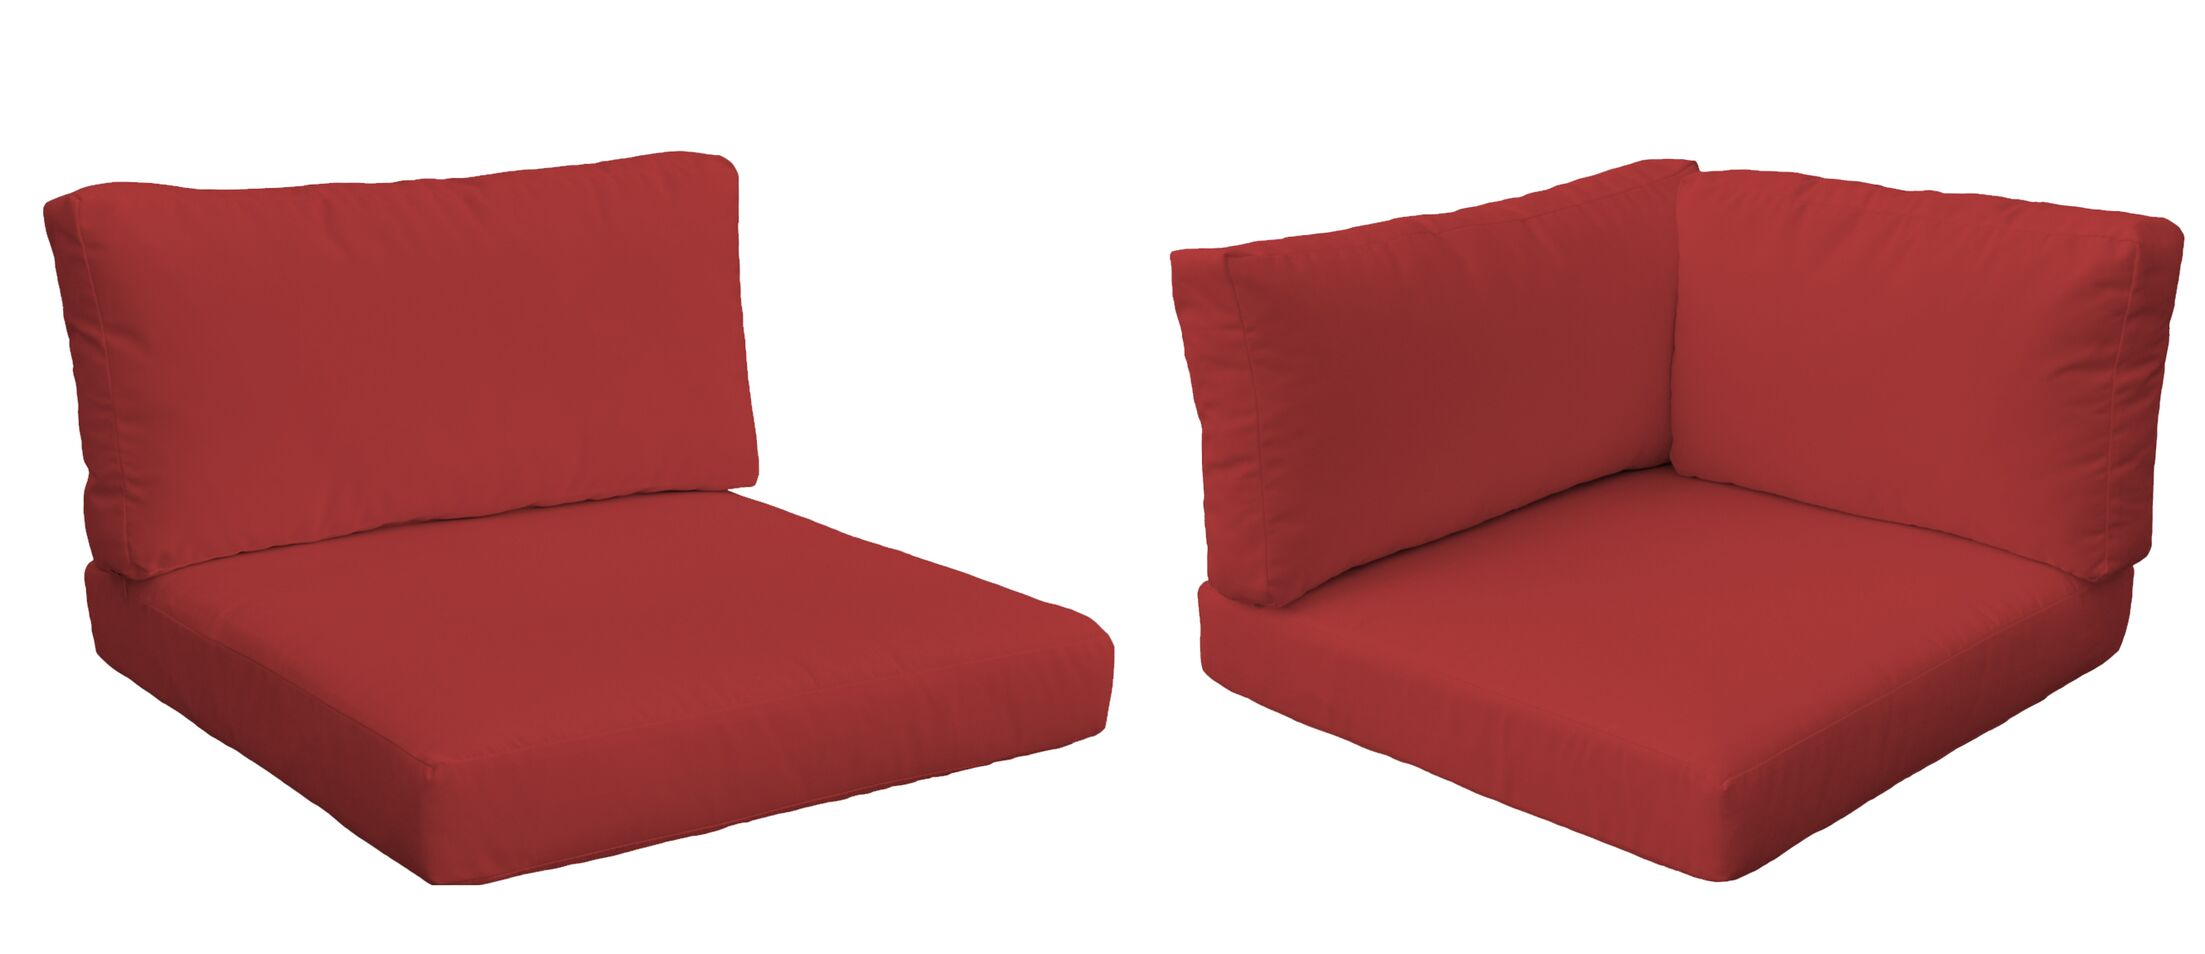 Monaco Outdoor 12 Piece Lounge Chair Cushion Set Fabric: Terracotta